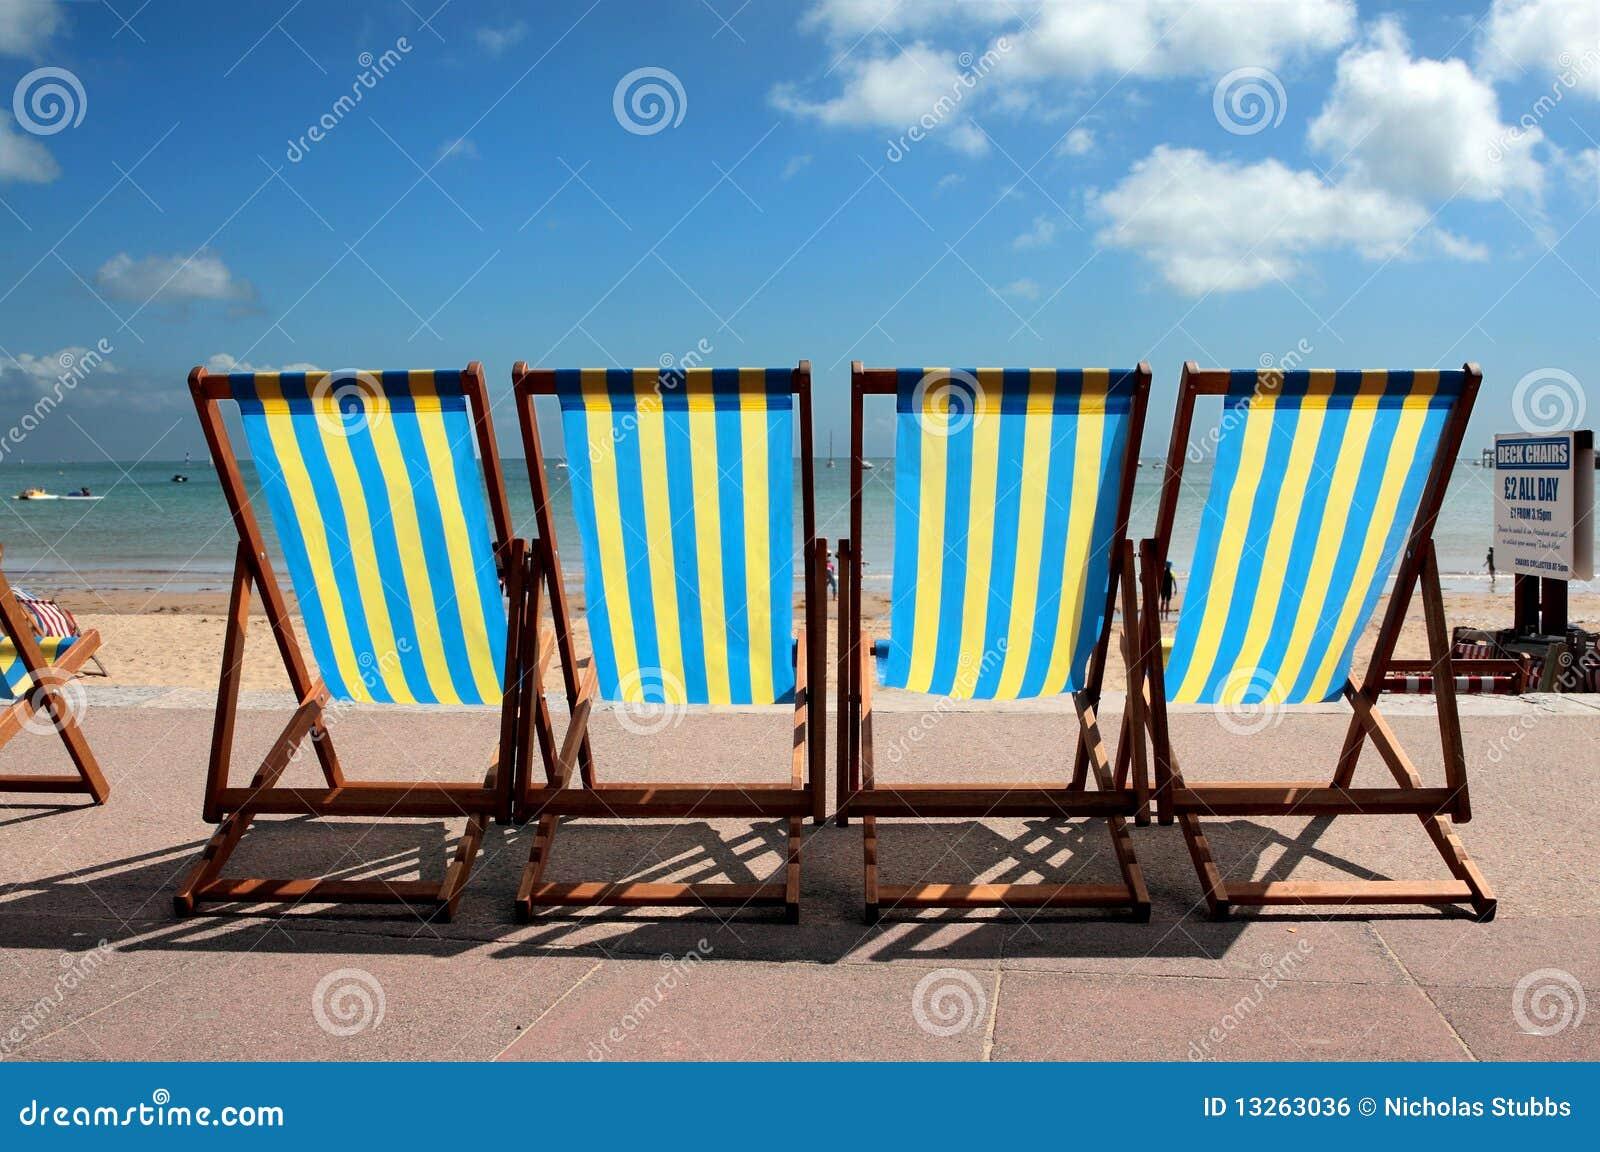 Row of colourful deckchairs on Weymouth beach